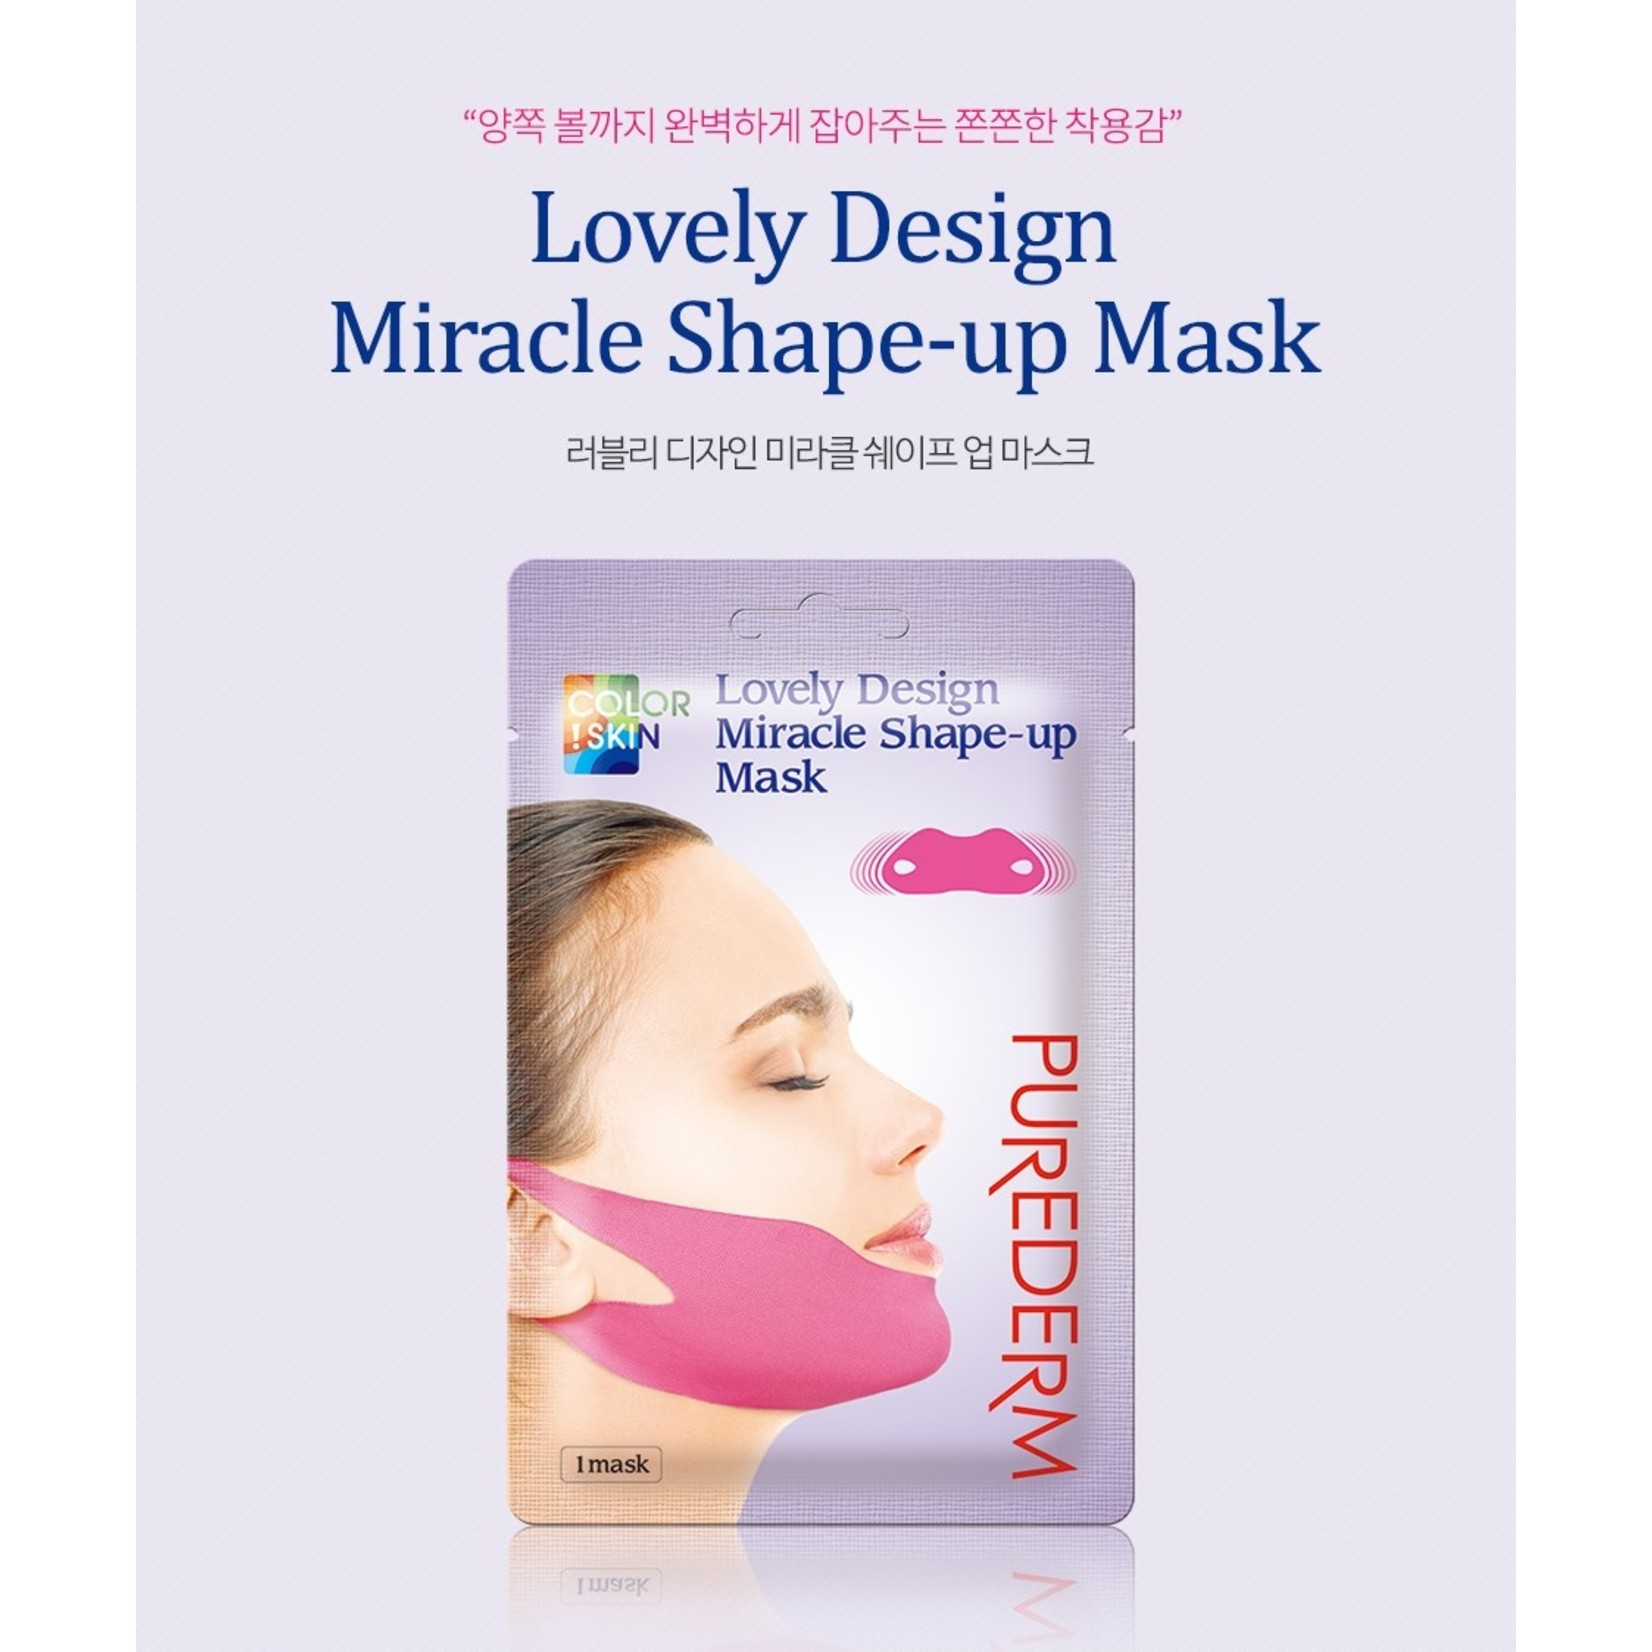 PUREDERM Lovely Design Miracle Shape-Up Mask